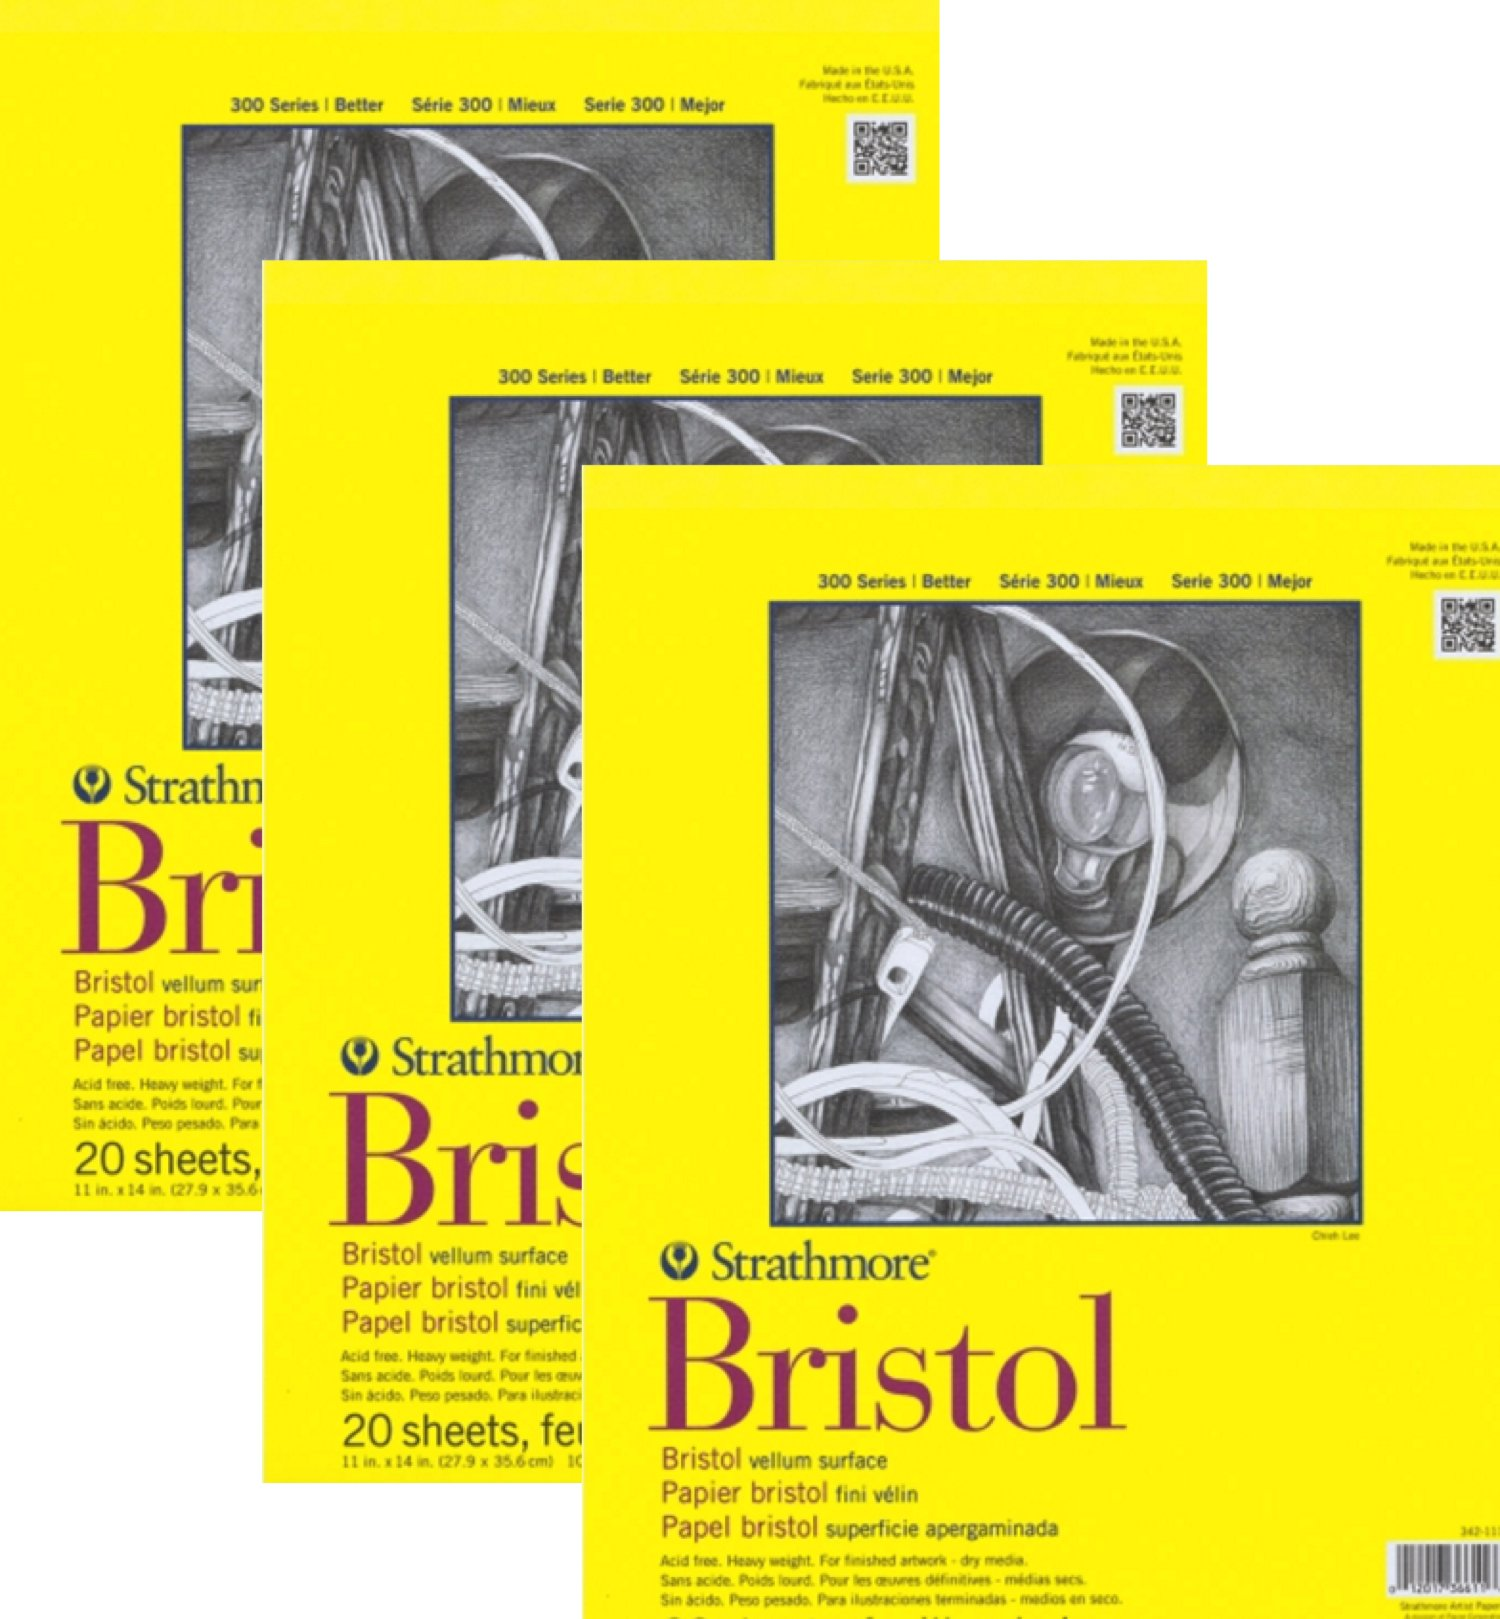 Strathmore 300- Bristol Board - 3 pack Bundle - Vellum Paper Pad - 9 x 12 - 20 Sheets Each Pad